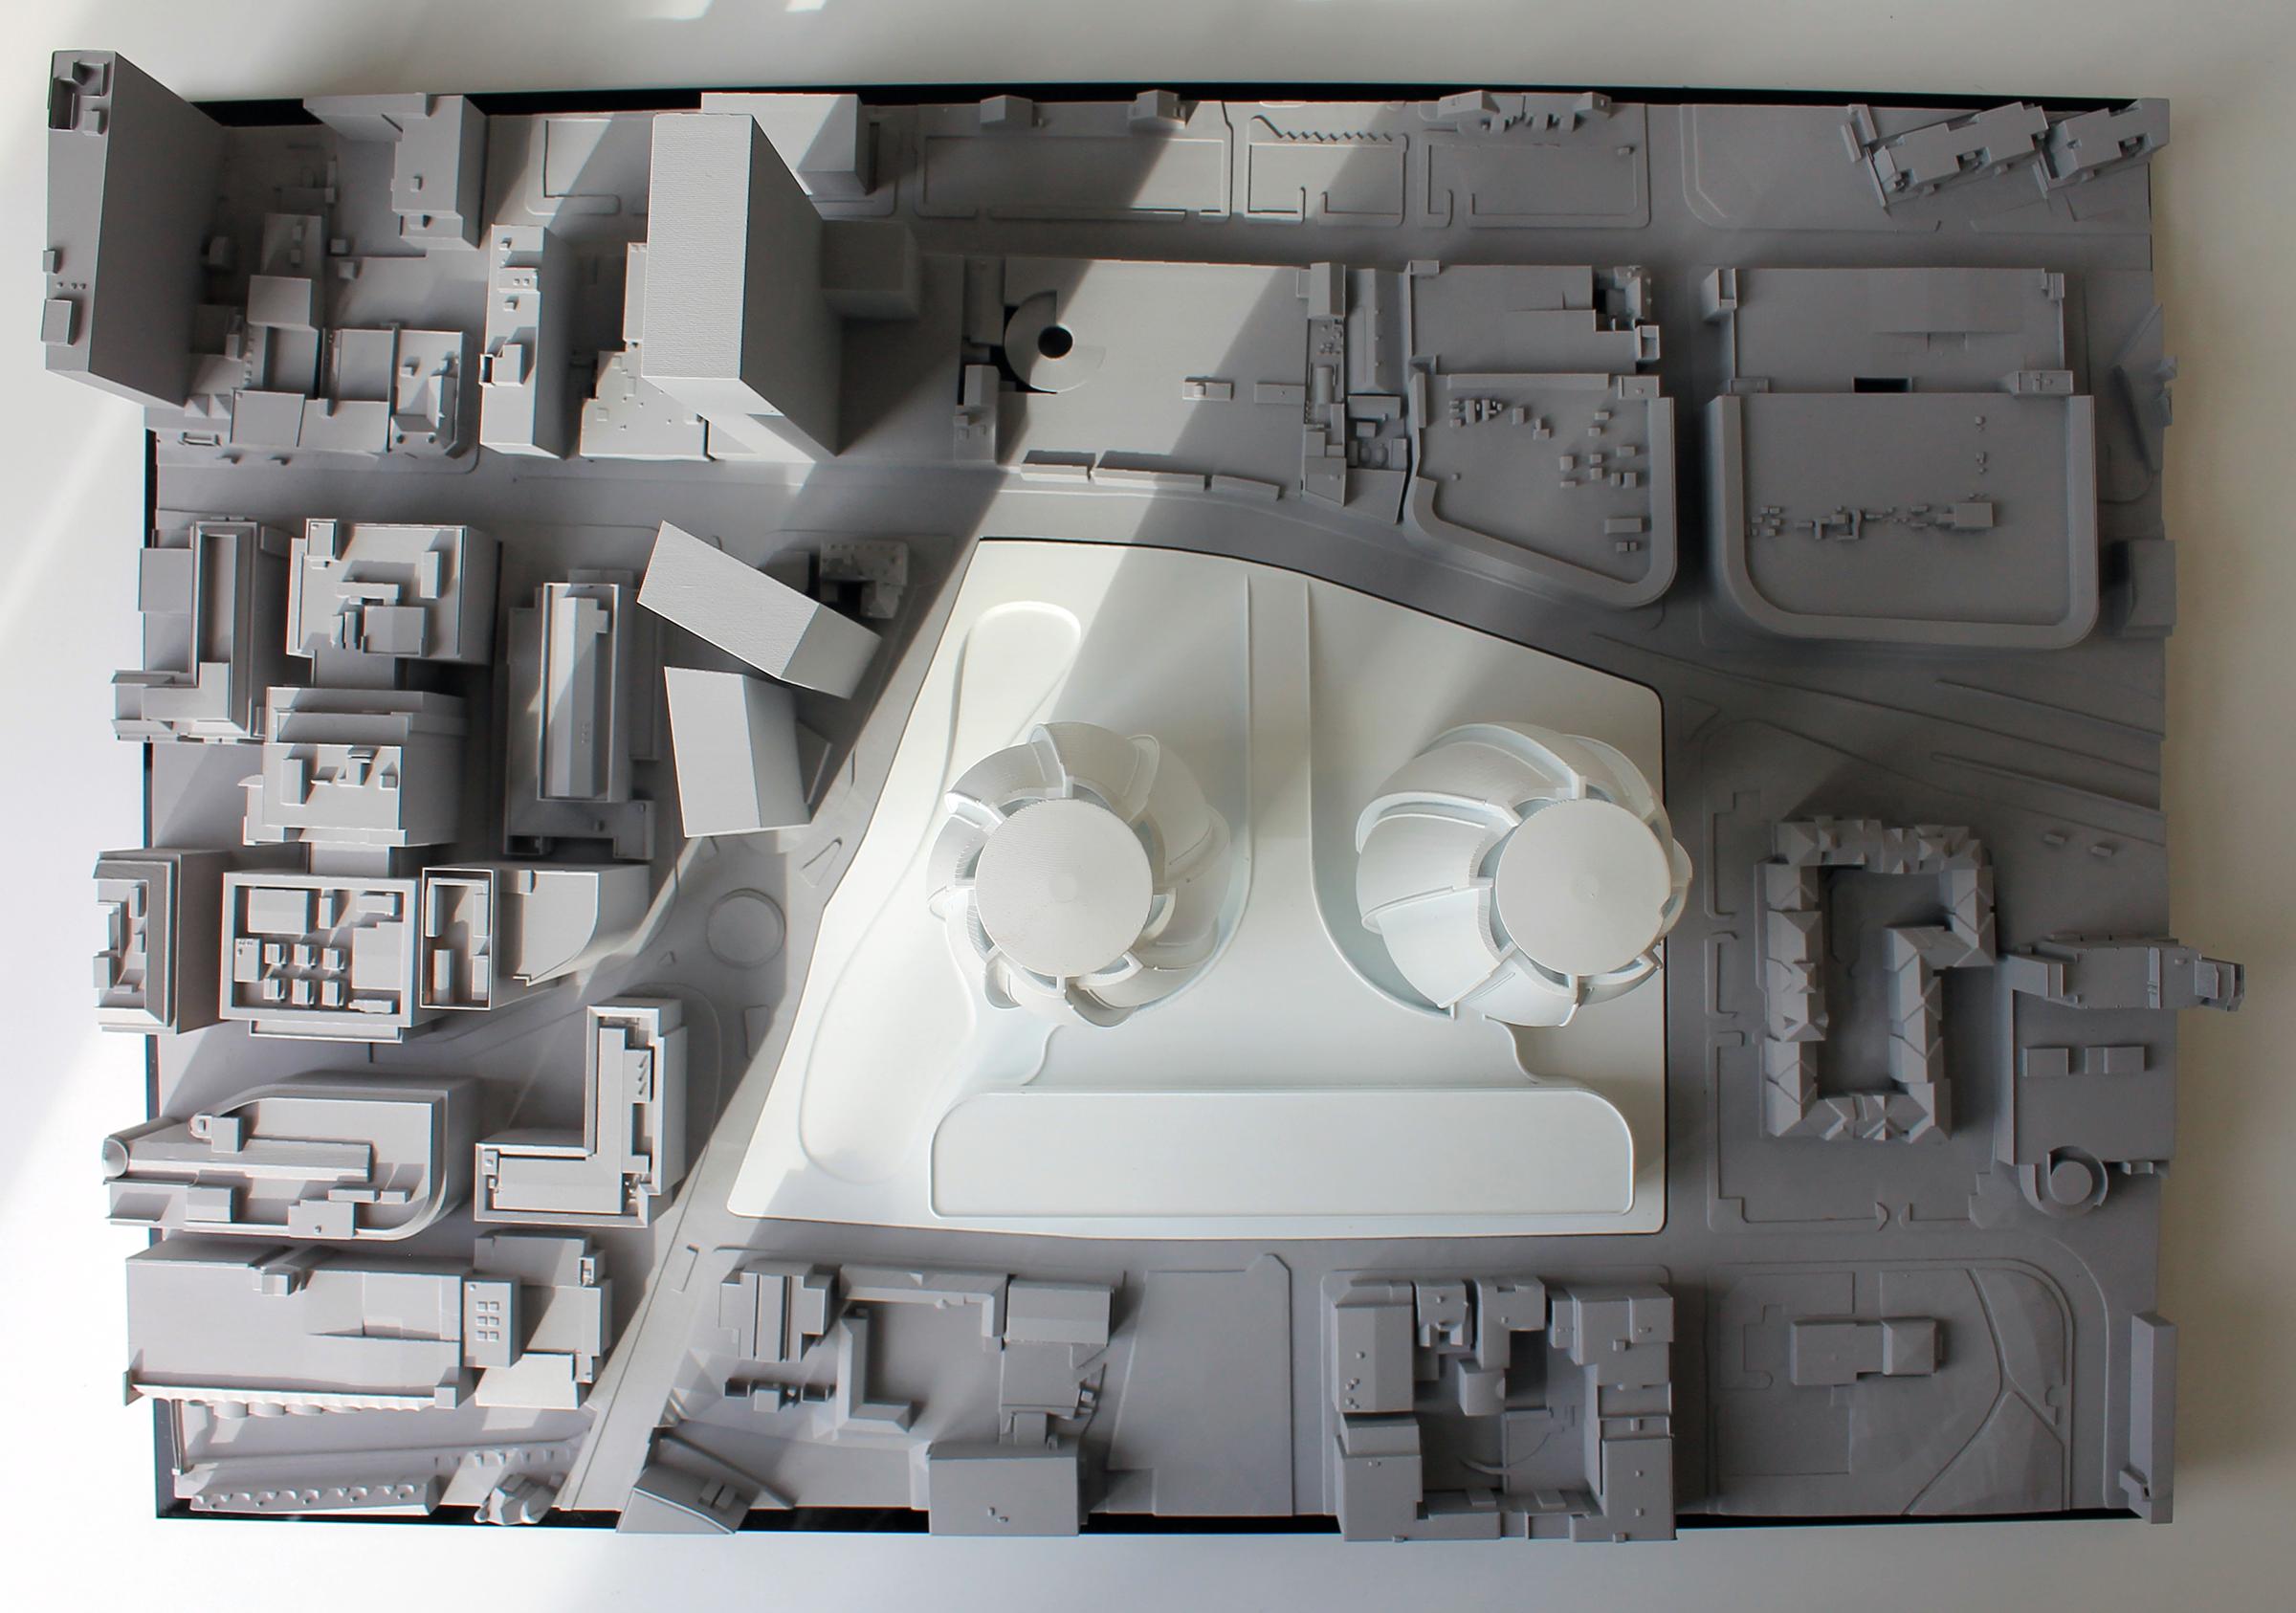 3D Printed Site Model SLA Resin with Plug